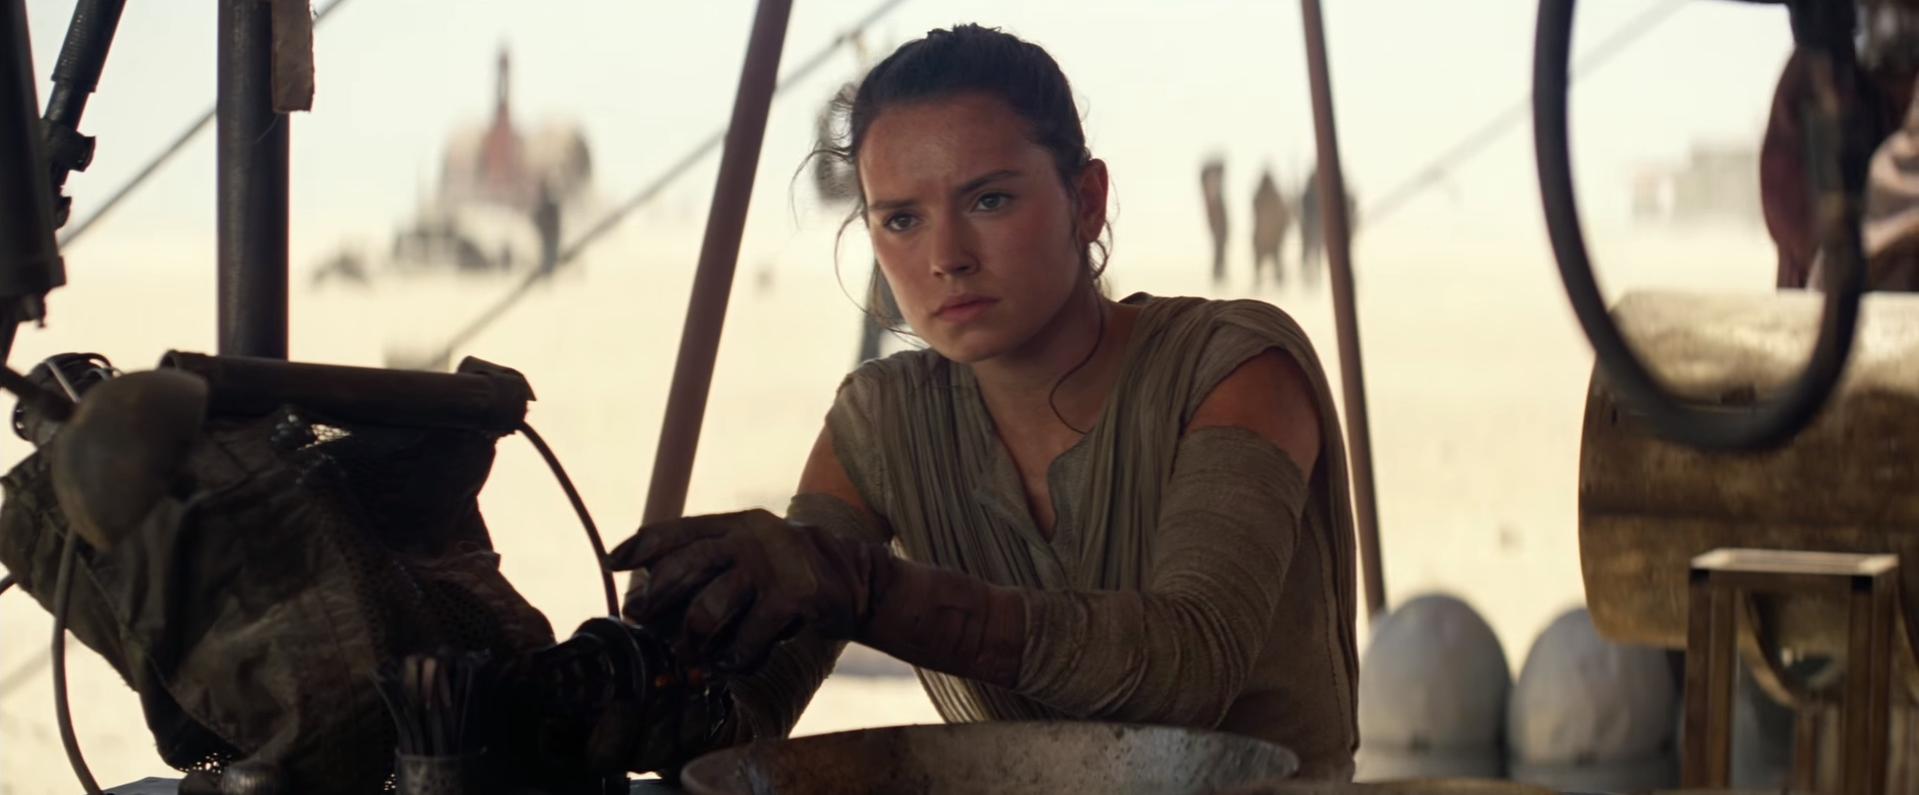 Rey from Star Wars looks at Sansa Stark.